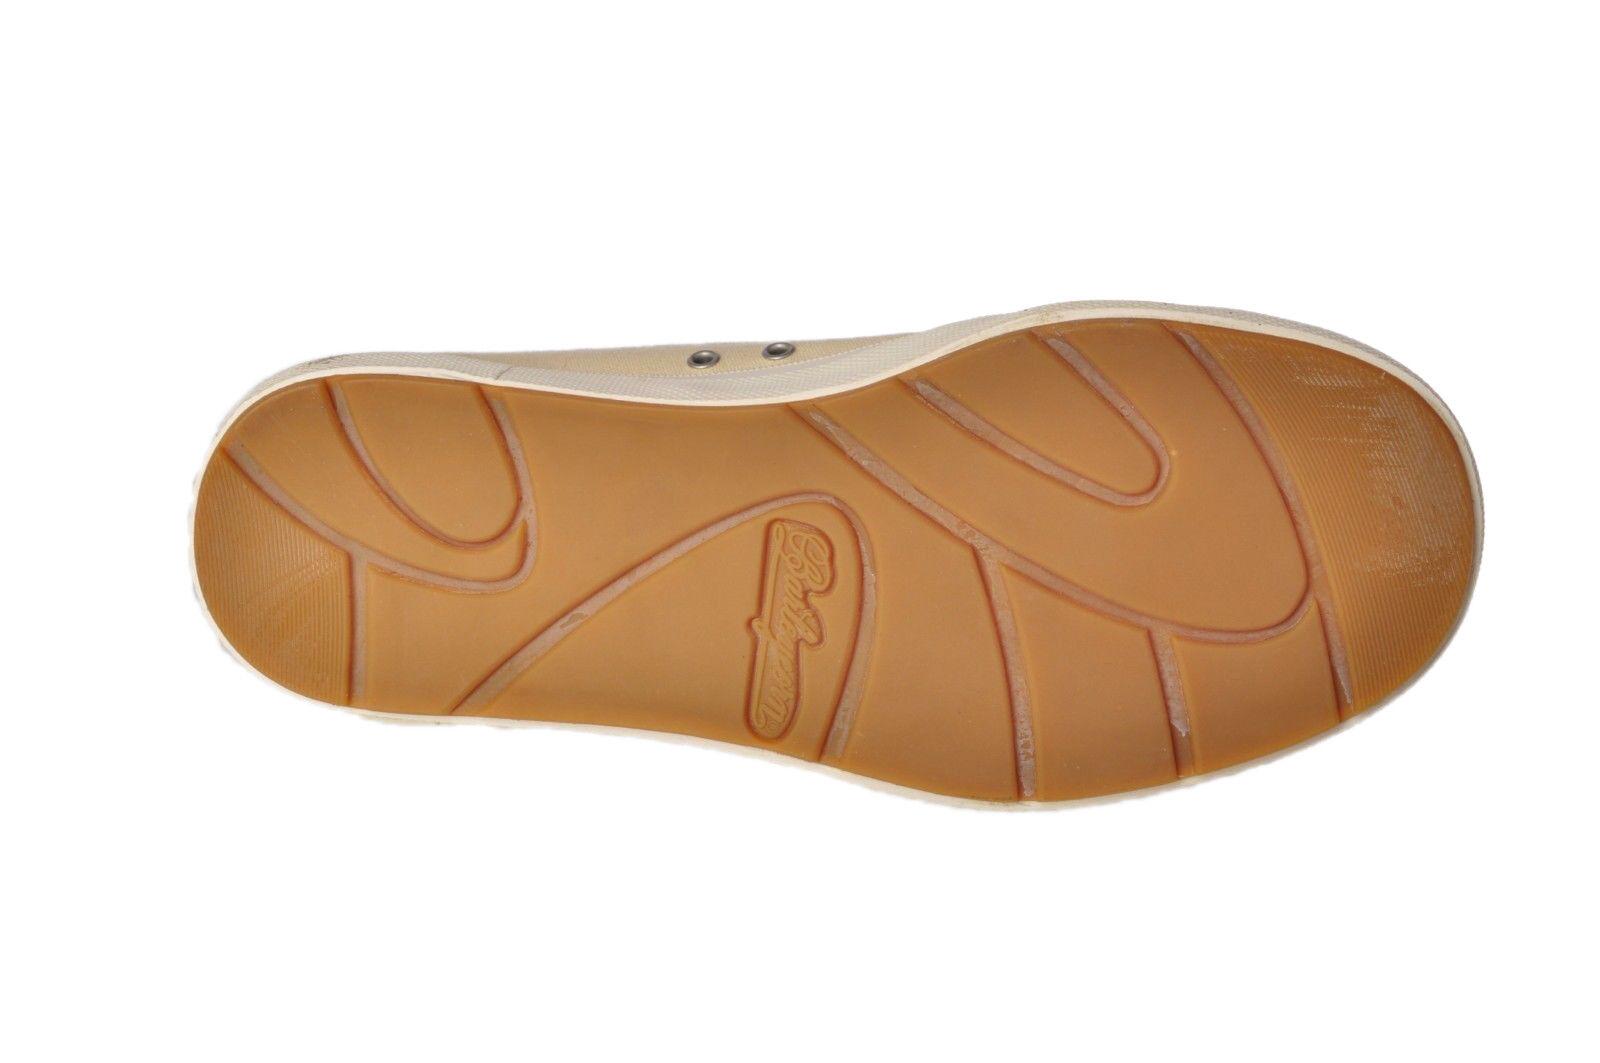 Barleycorn - Scarpe-scarpe da ginnastica basse - Donna - Bianco Bianco Bianco - 5144320C183546 bea442